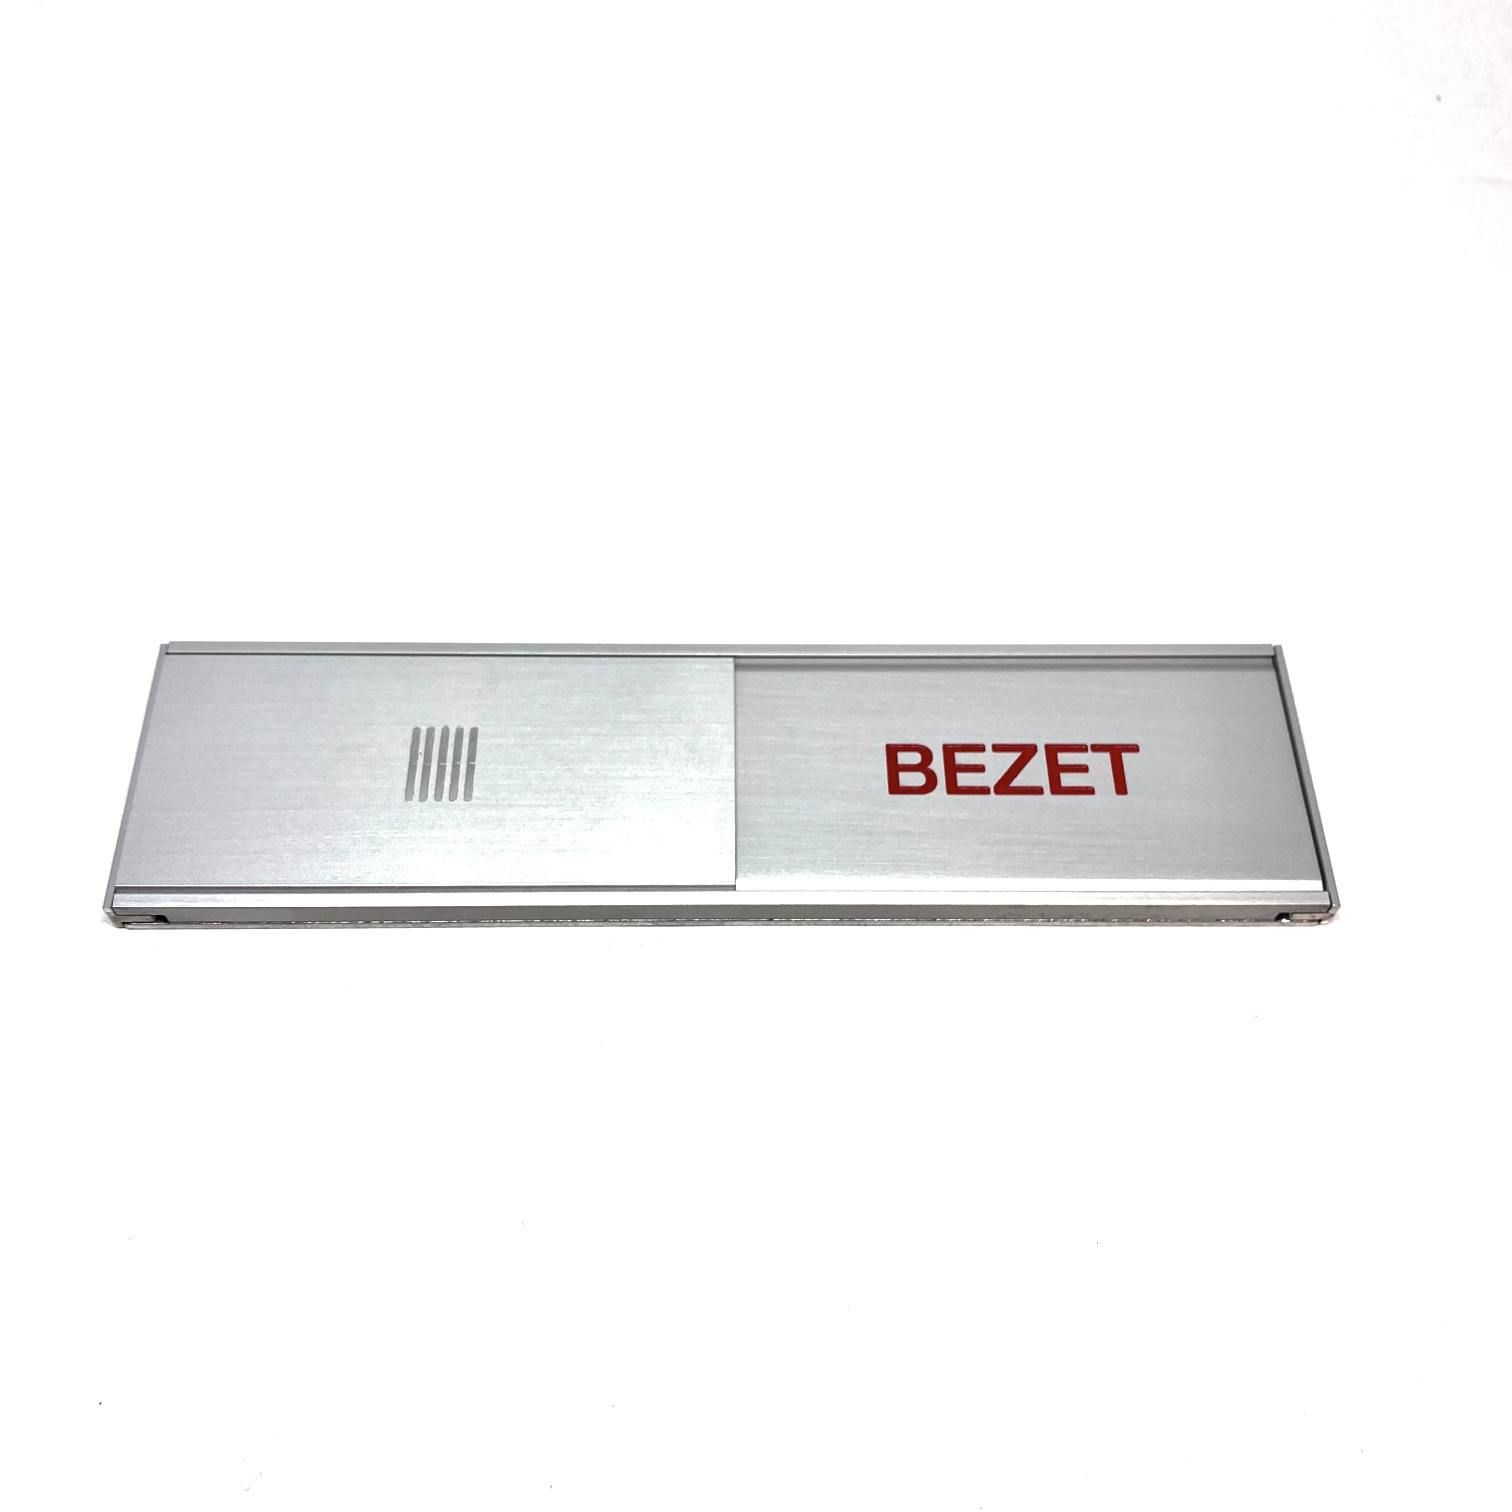 Plaque de porte en aluminium VRIJ / BEZET